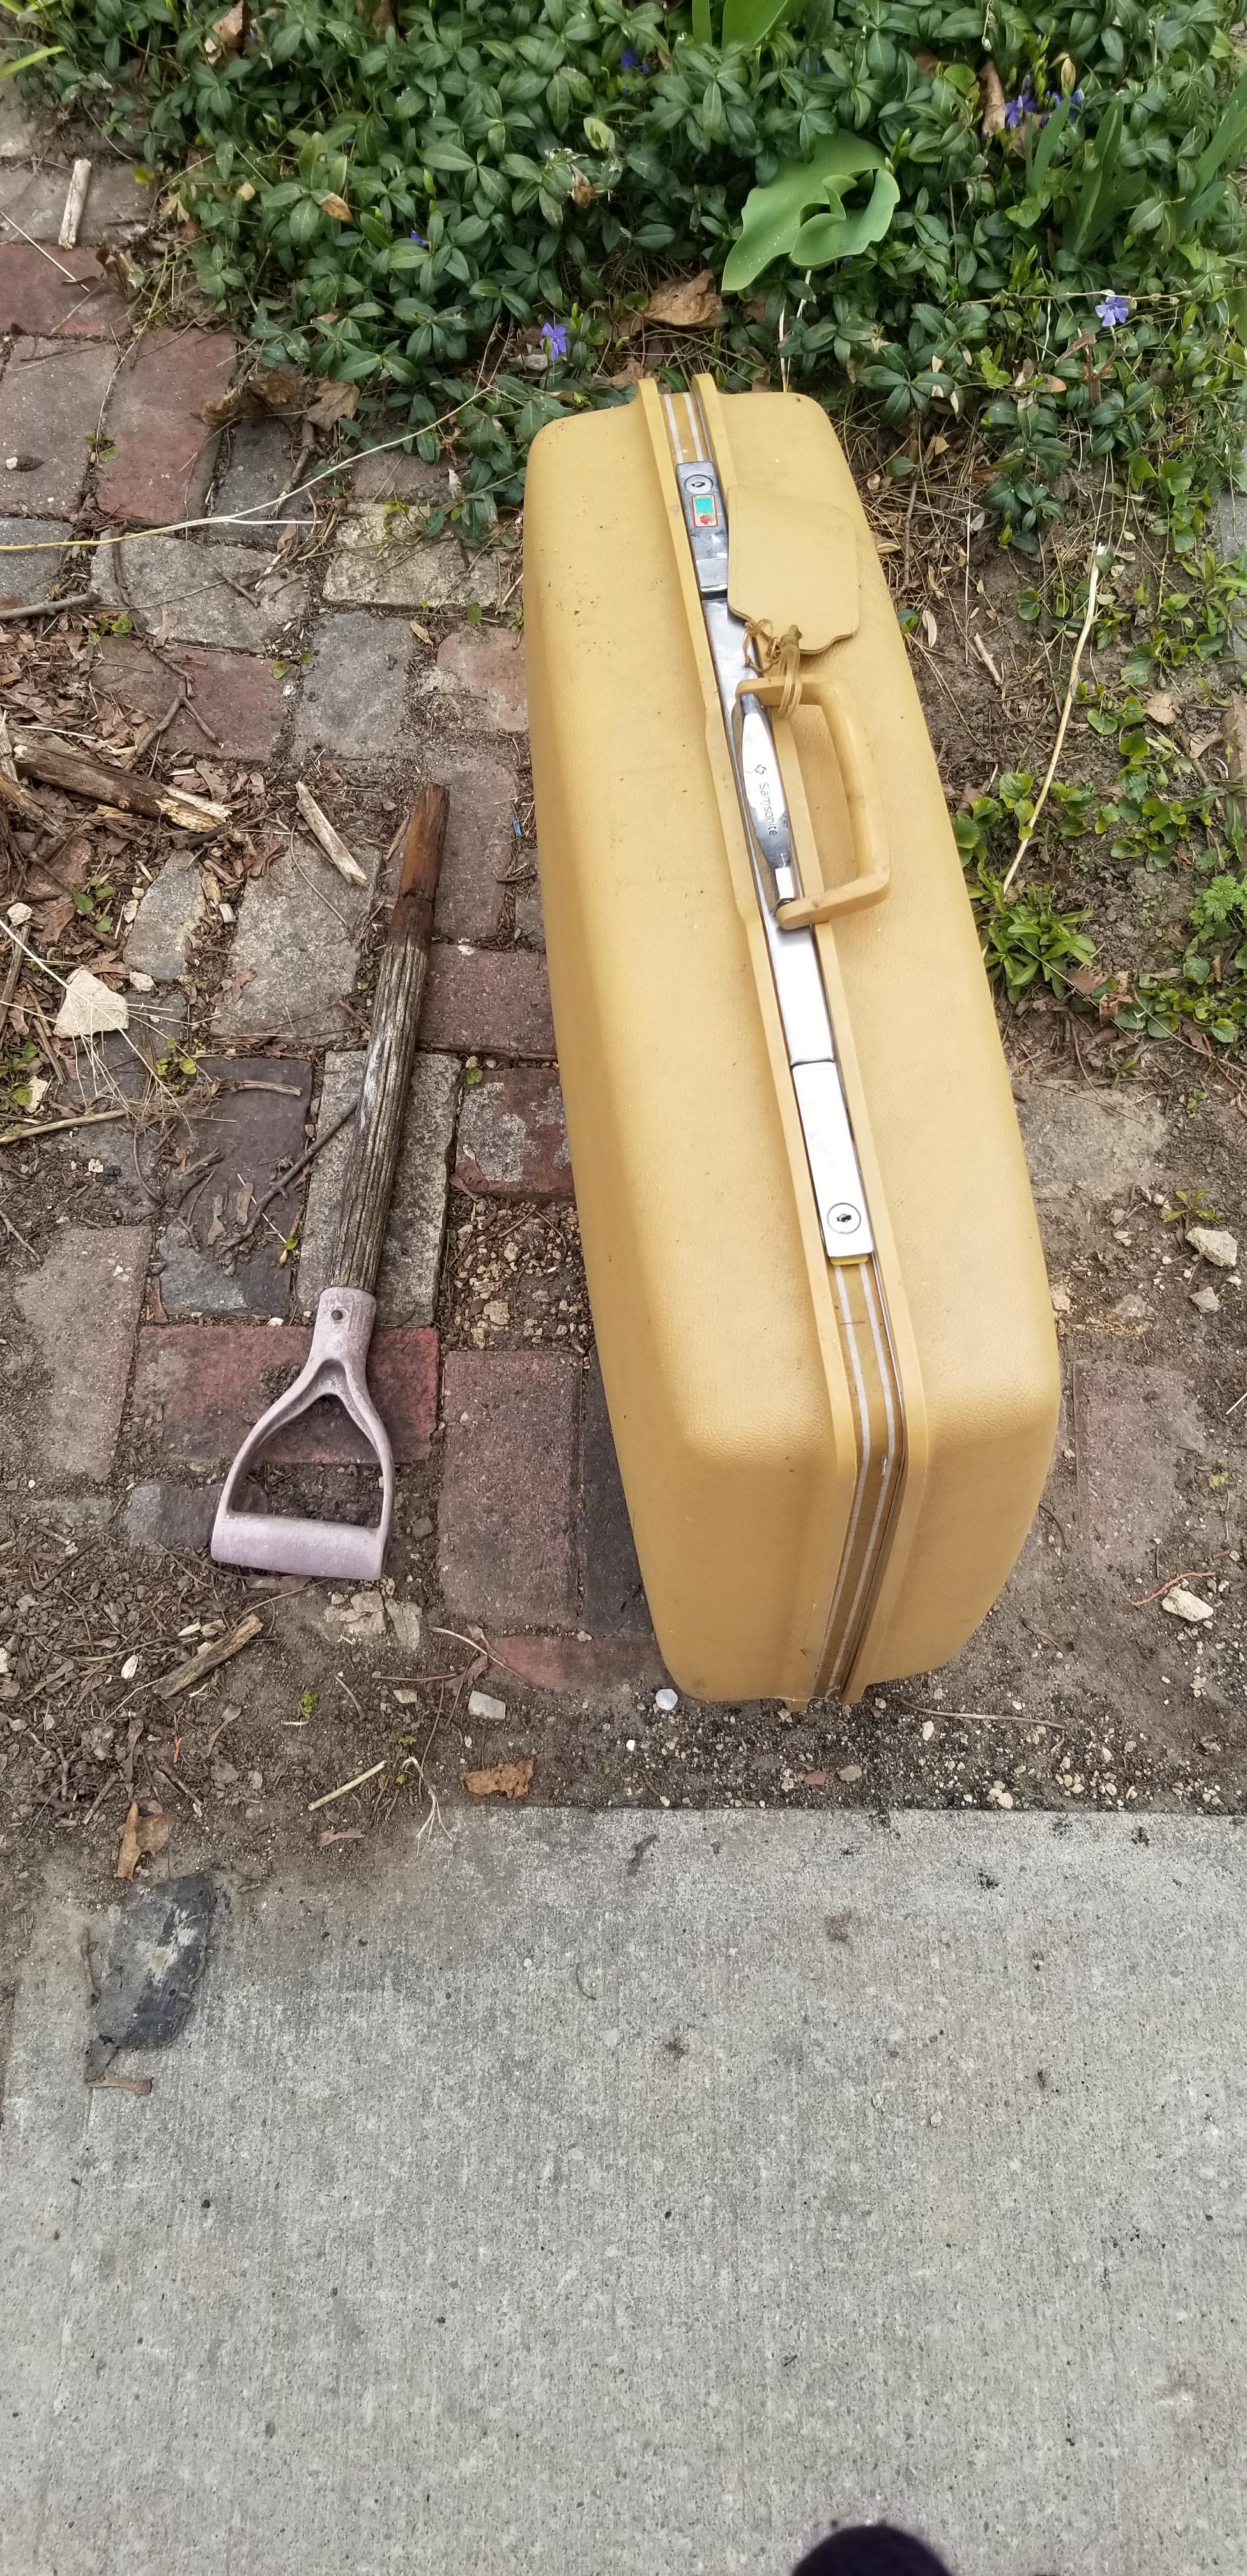 01_zab_suitcase